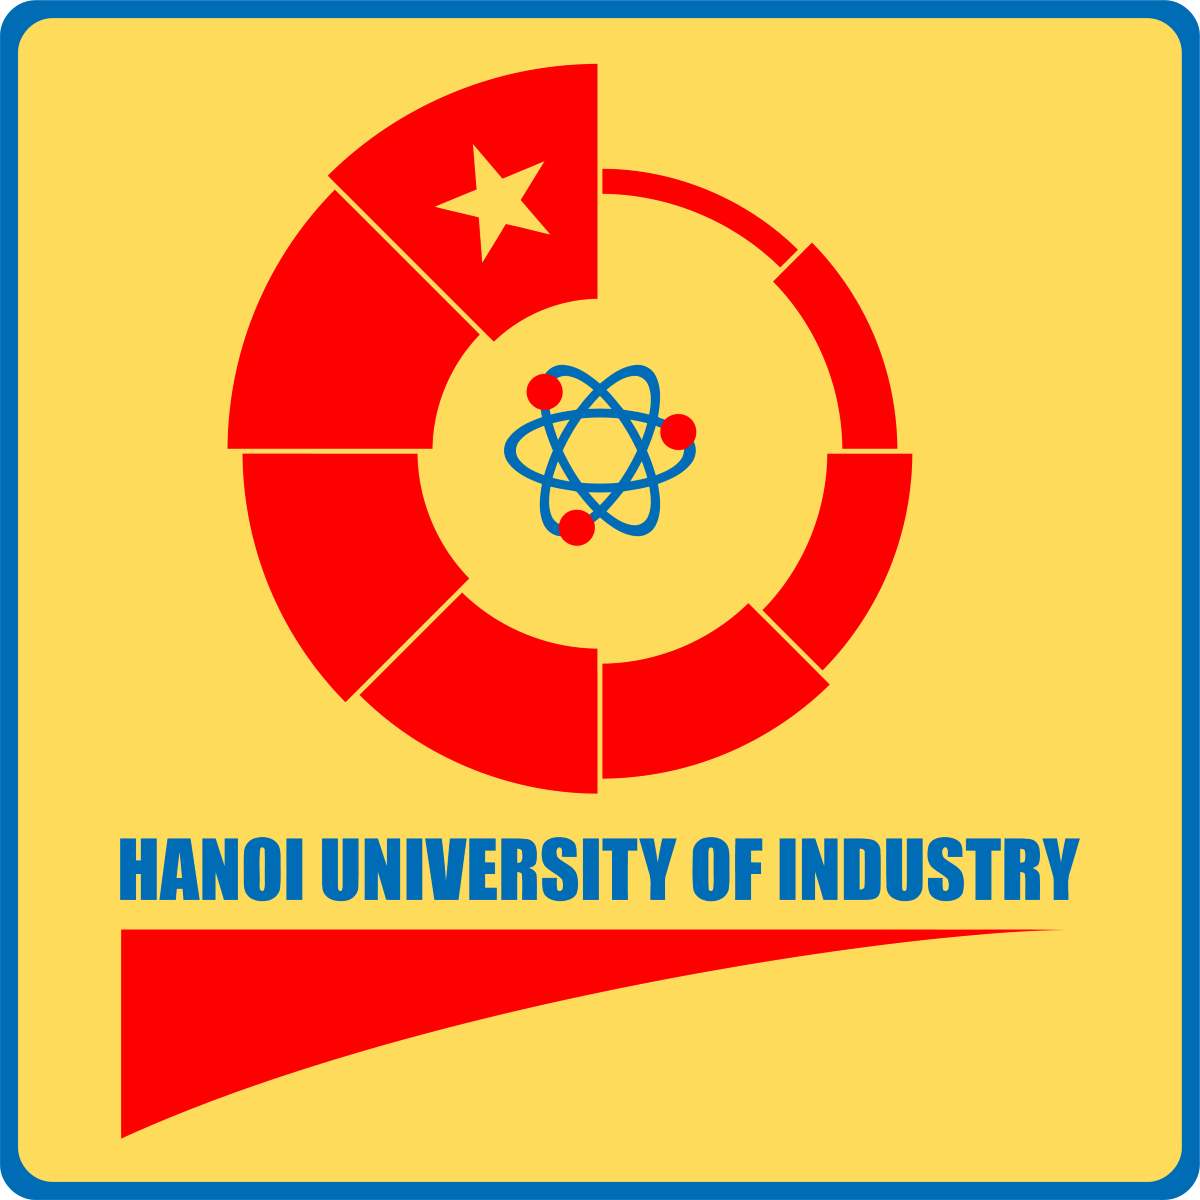 Logo DH Cong nghiep Ha Noi